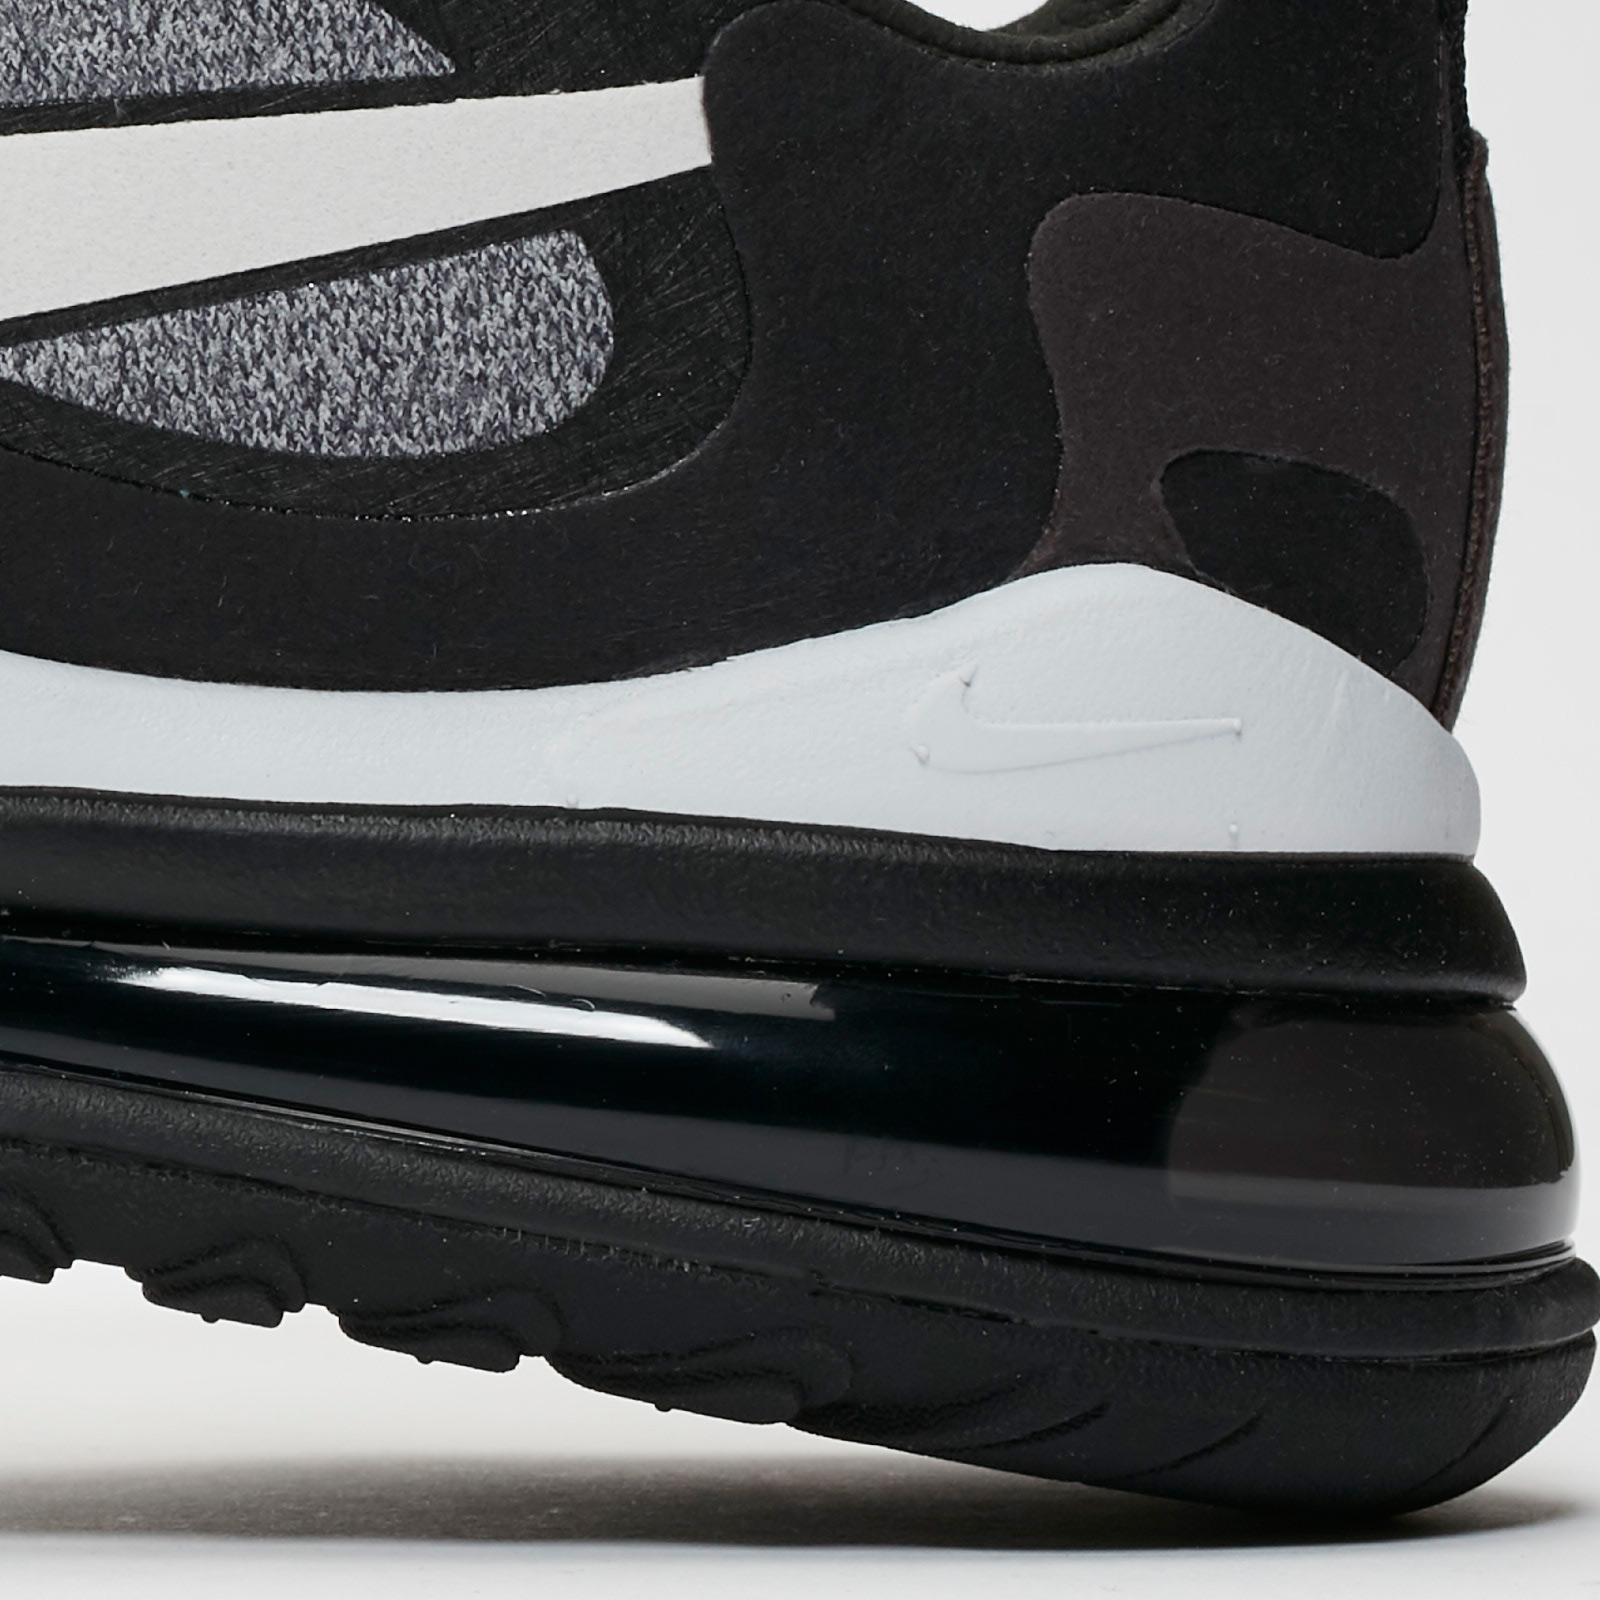 Nike Air Max 270 React Ao4971 001 Sneakersnstuff